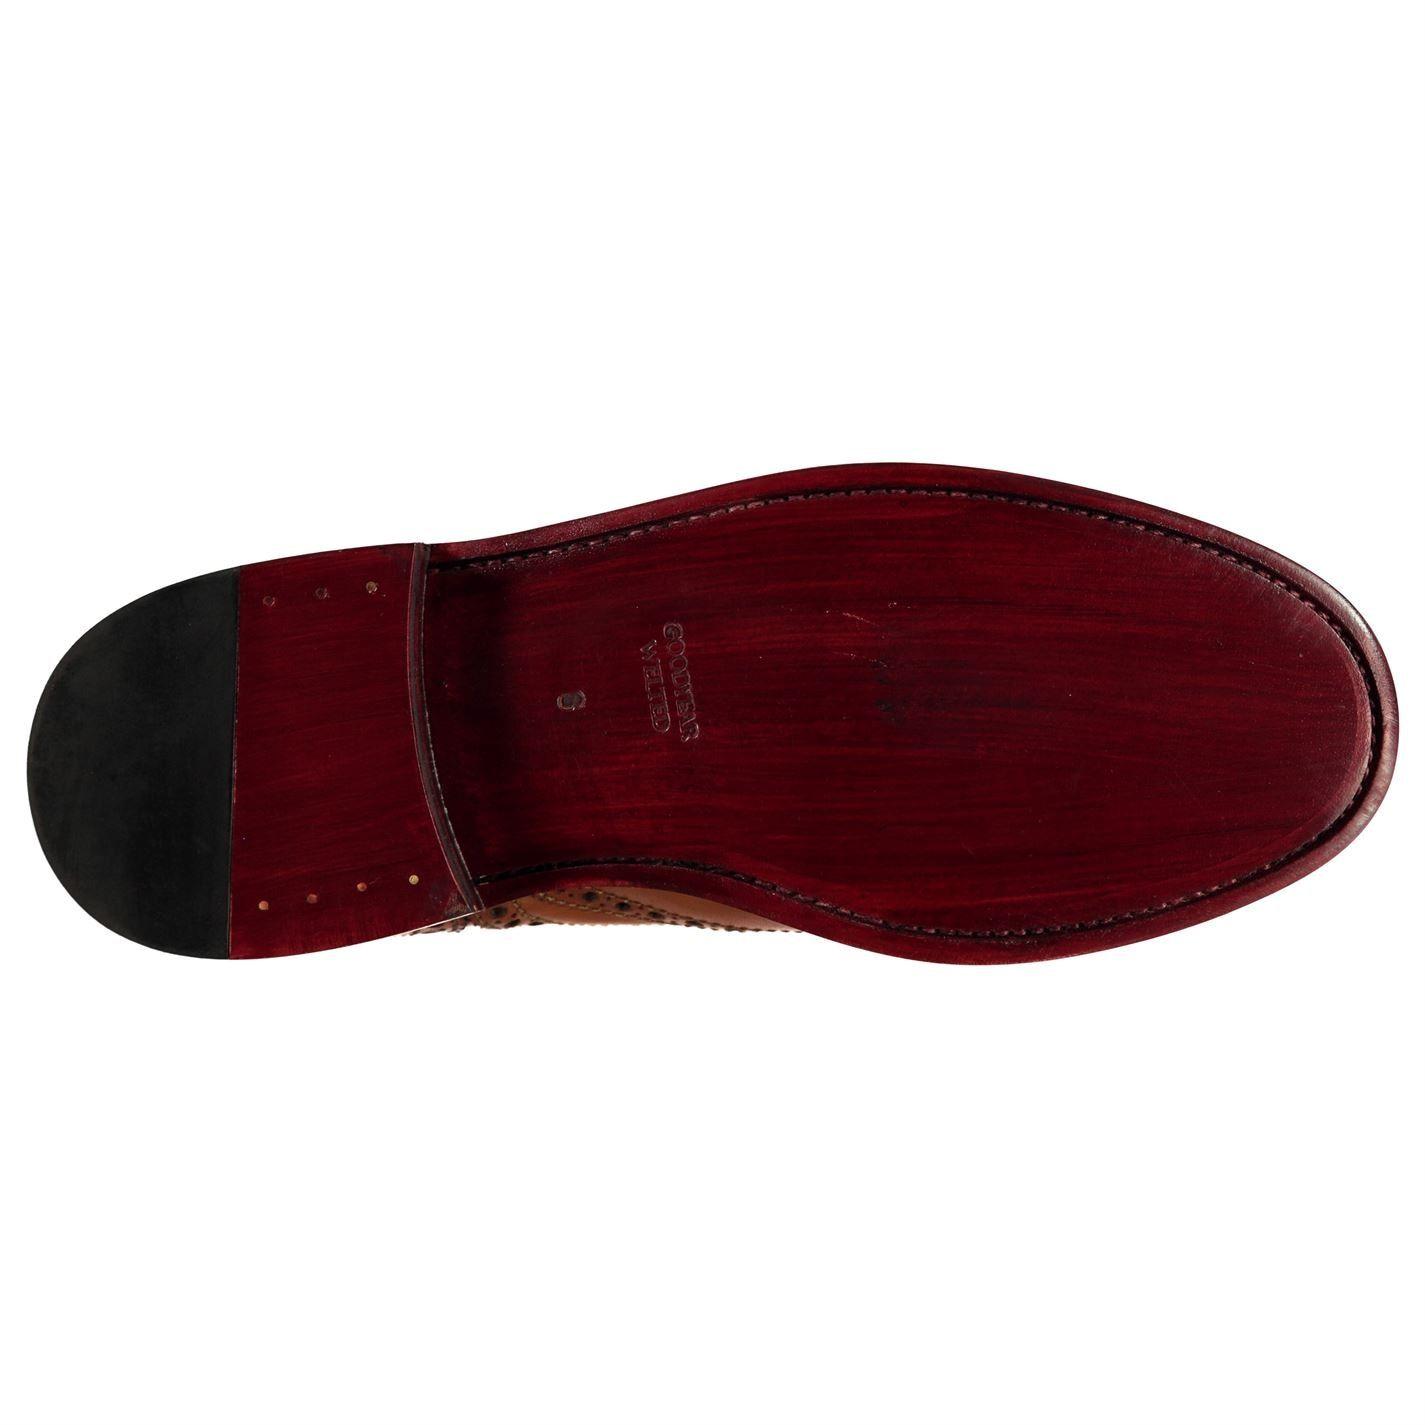 Firetrap Mens Blackseal Highbury Shoes Brogues Lace Up Tonal Stitching Brogue